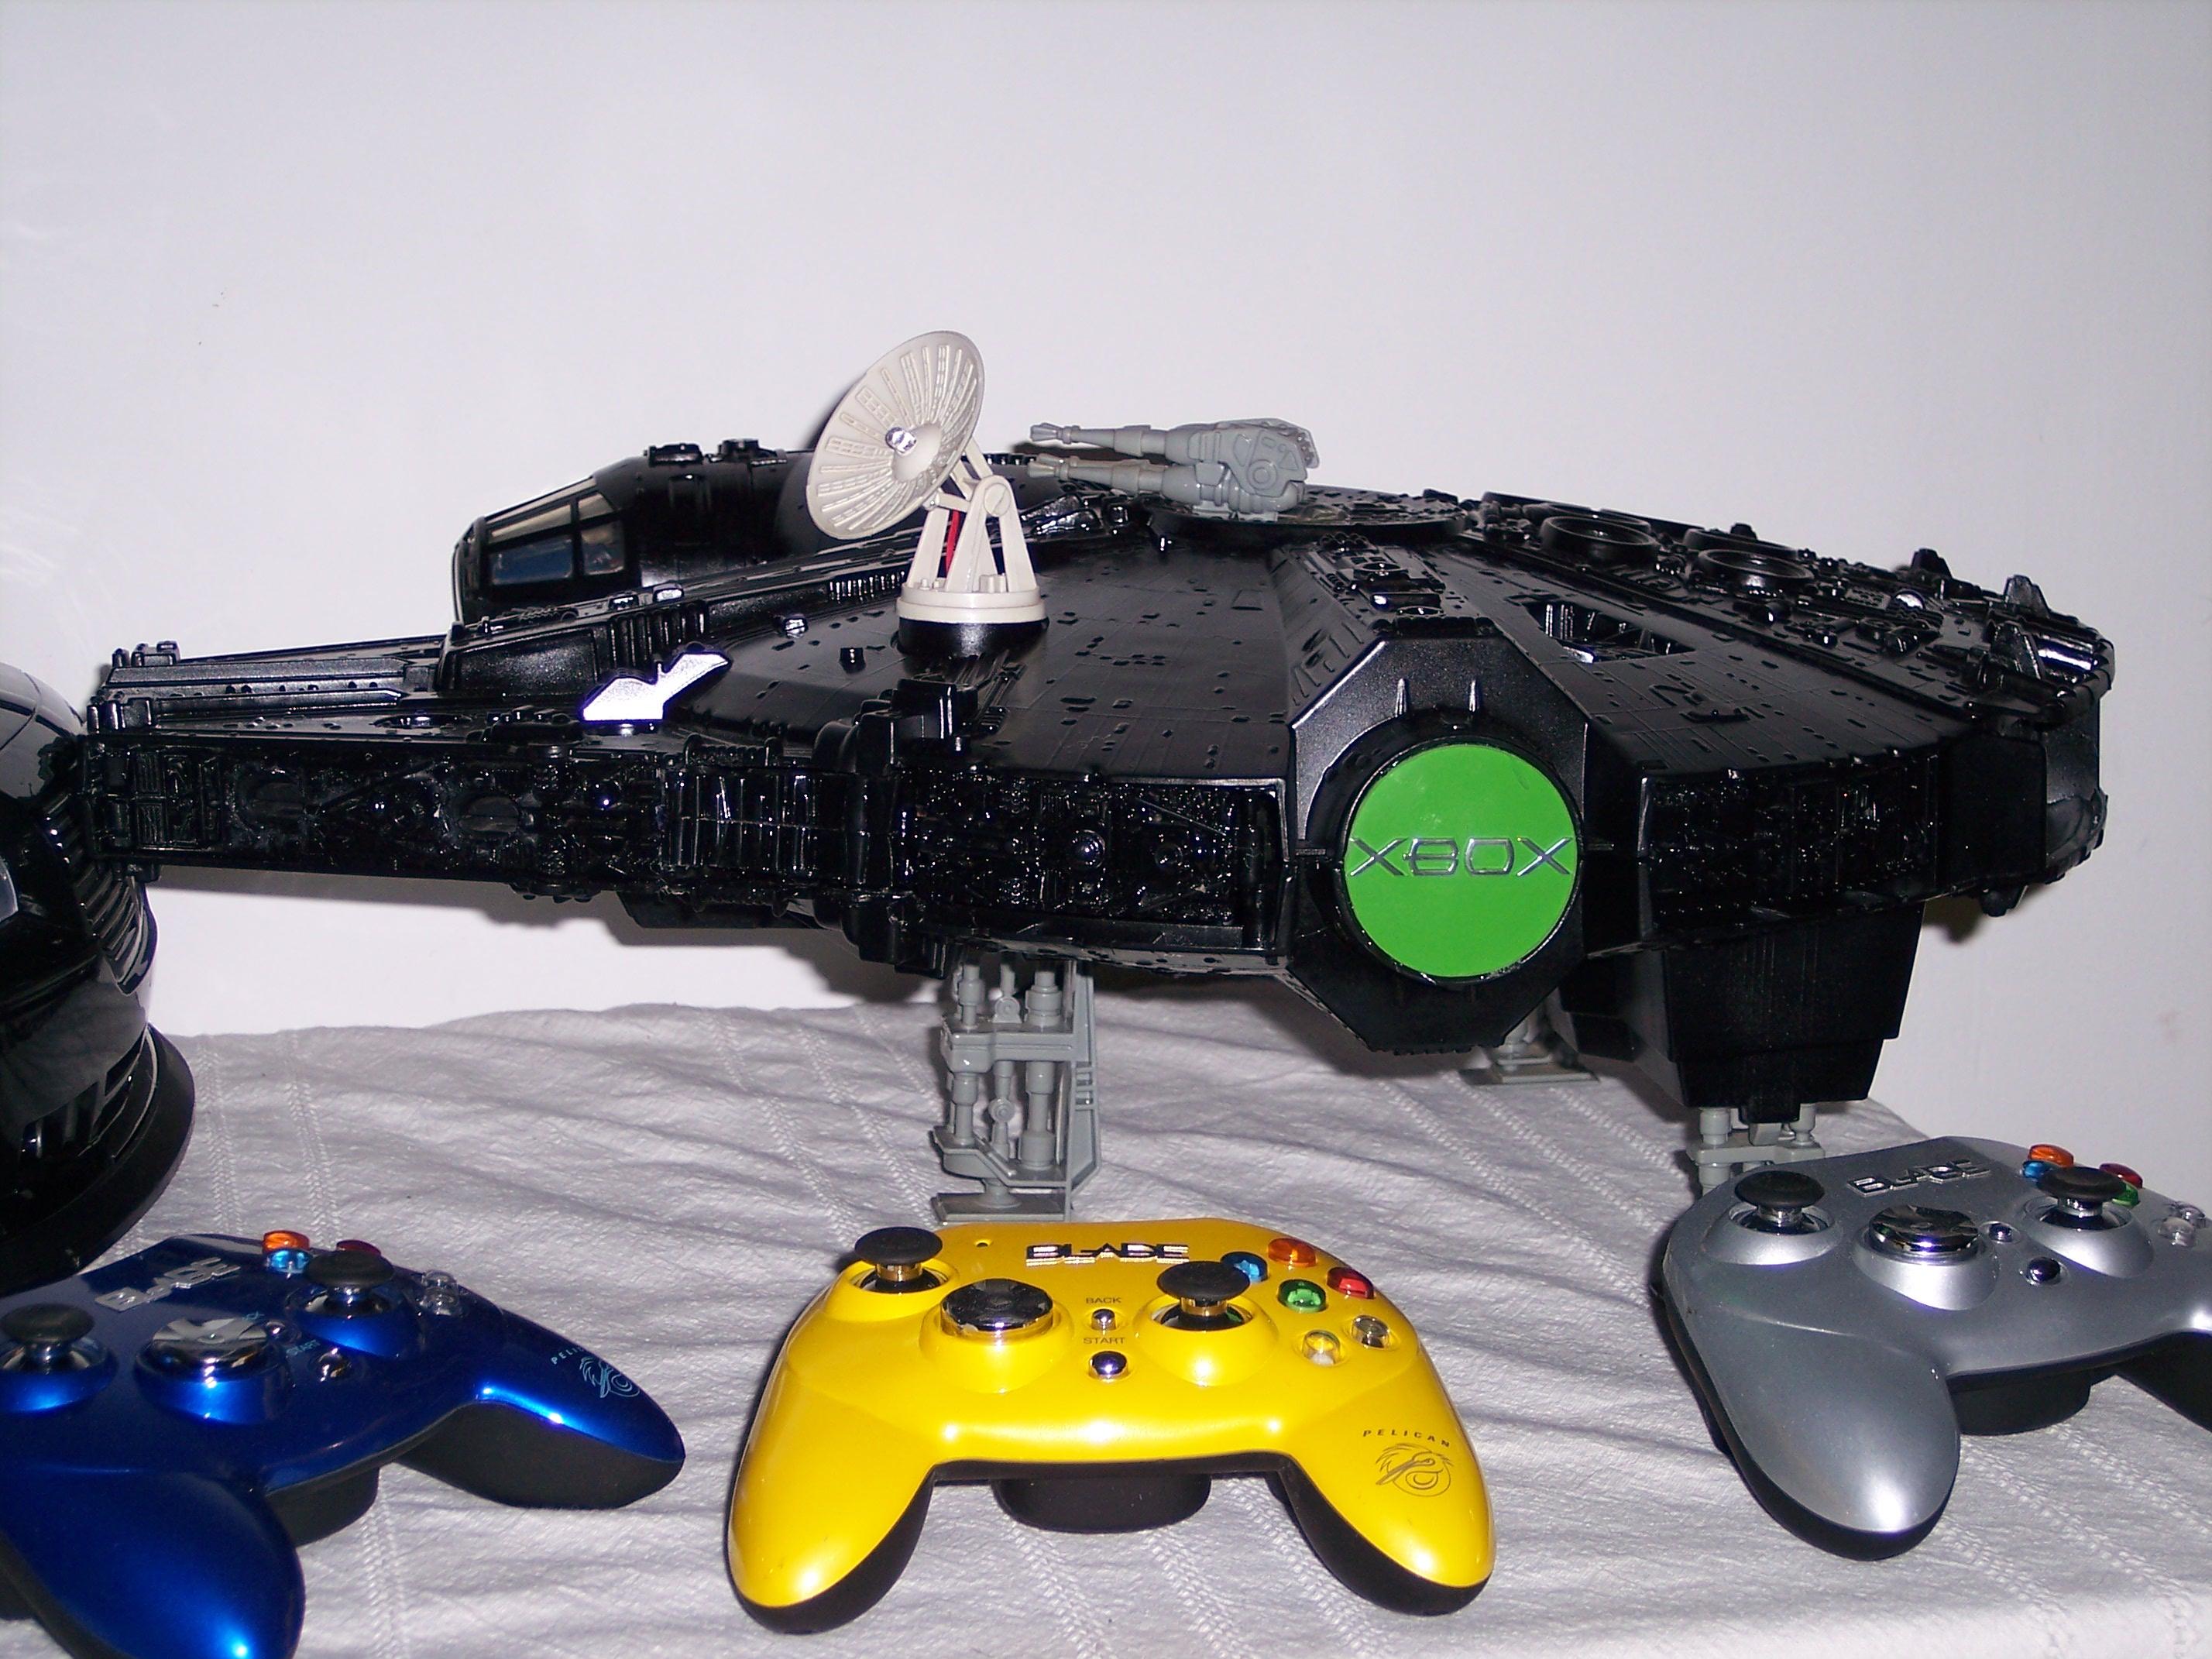 How to mod xbox into Star Wars Millennium Falcon